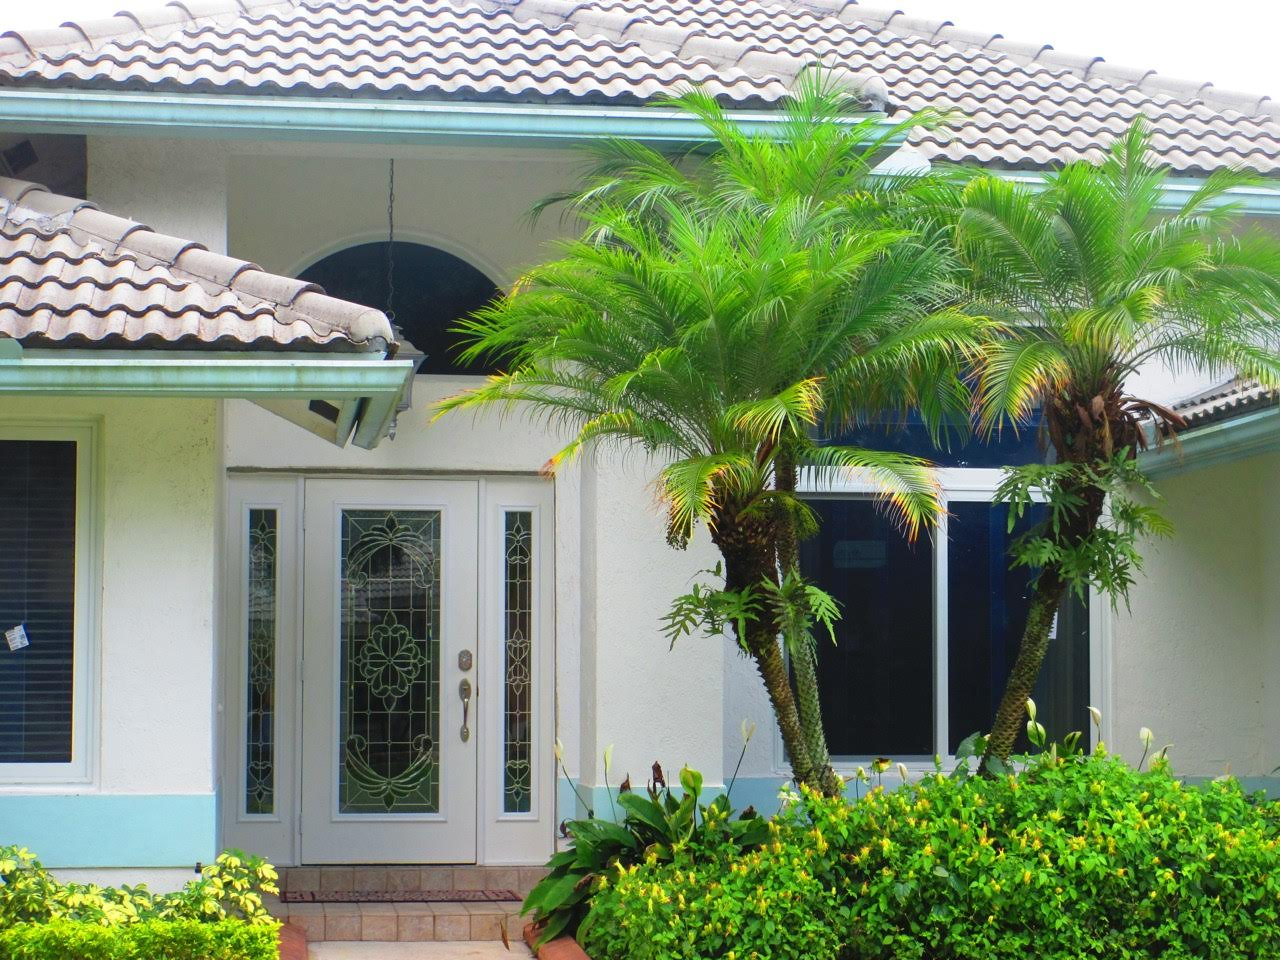 Delray Beach, FL hurricane impact resistant windows and doors.